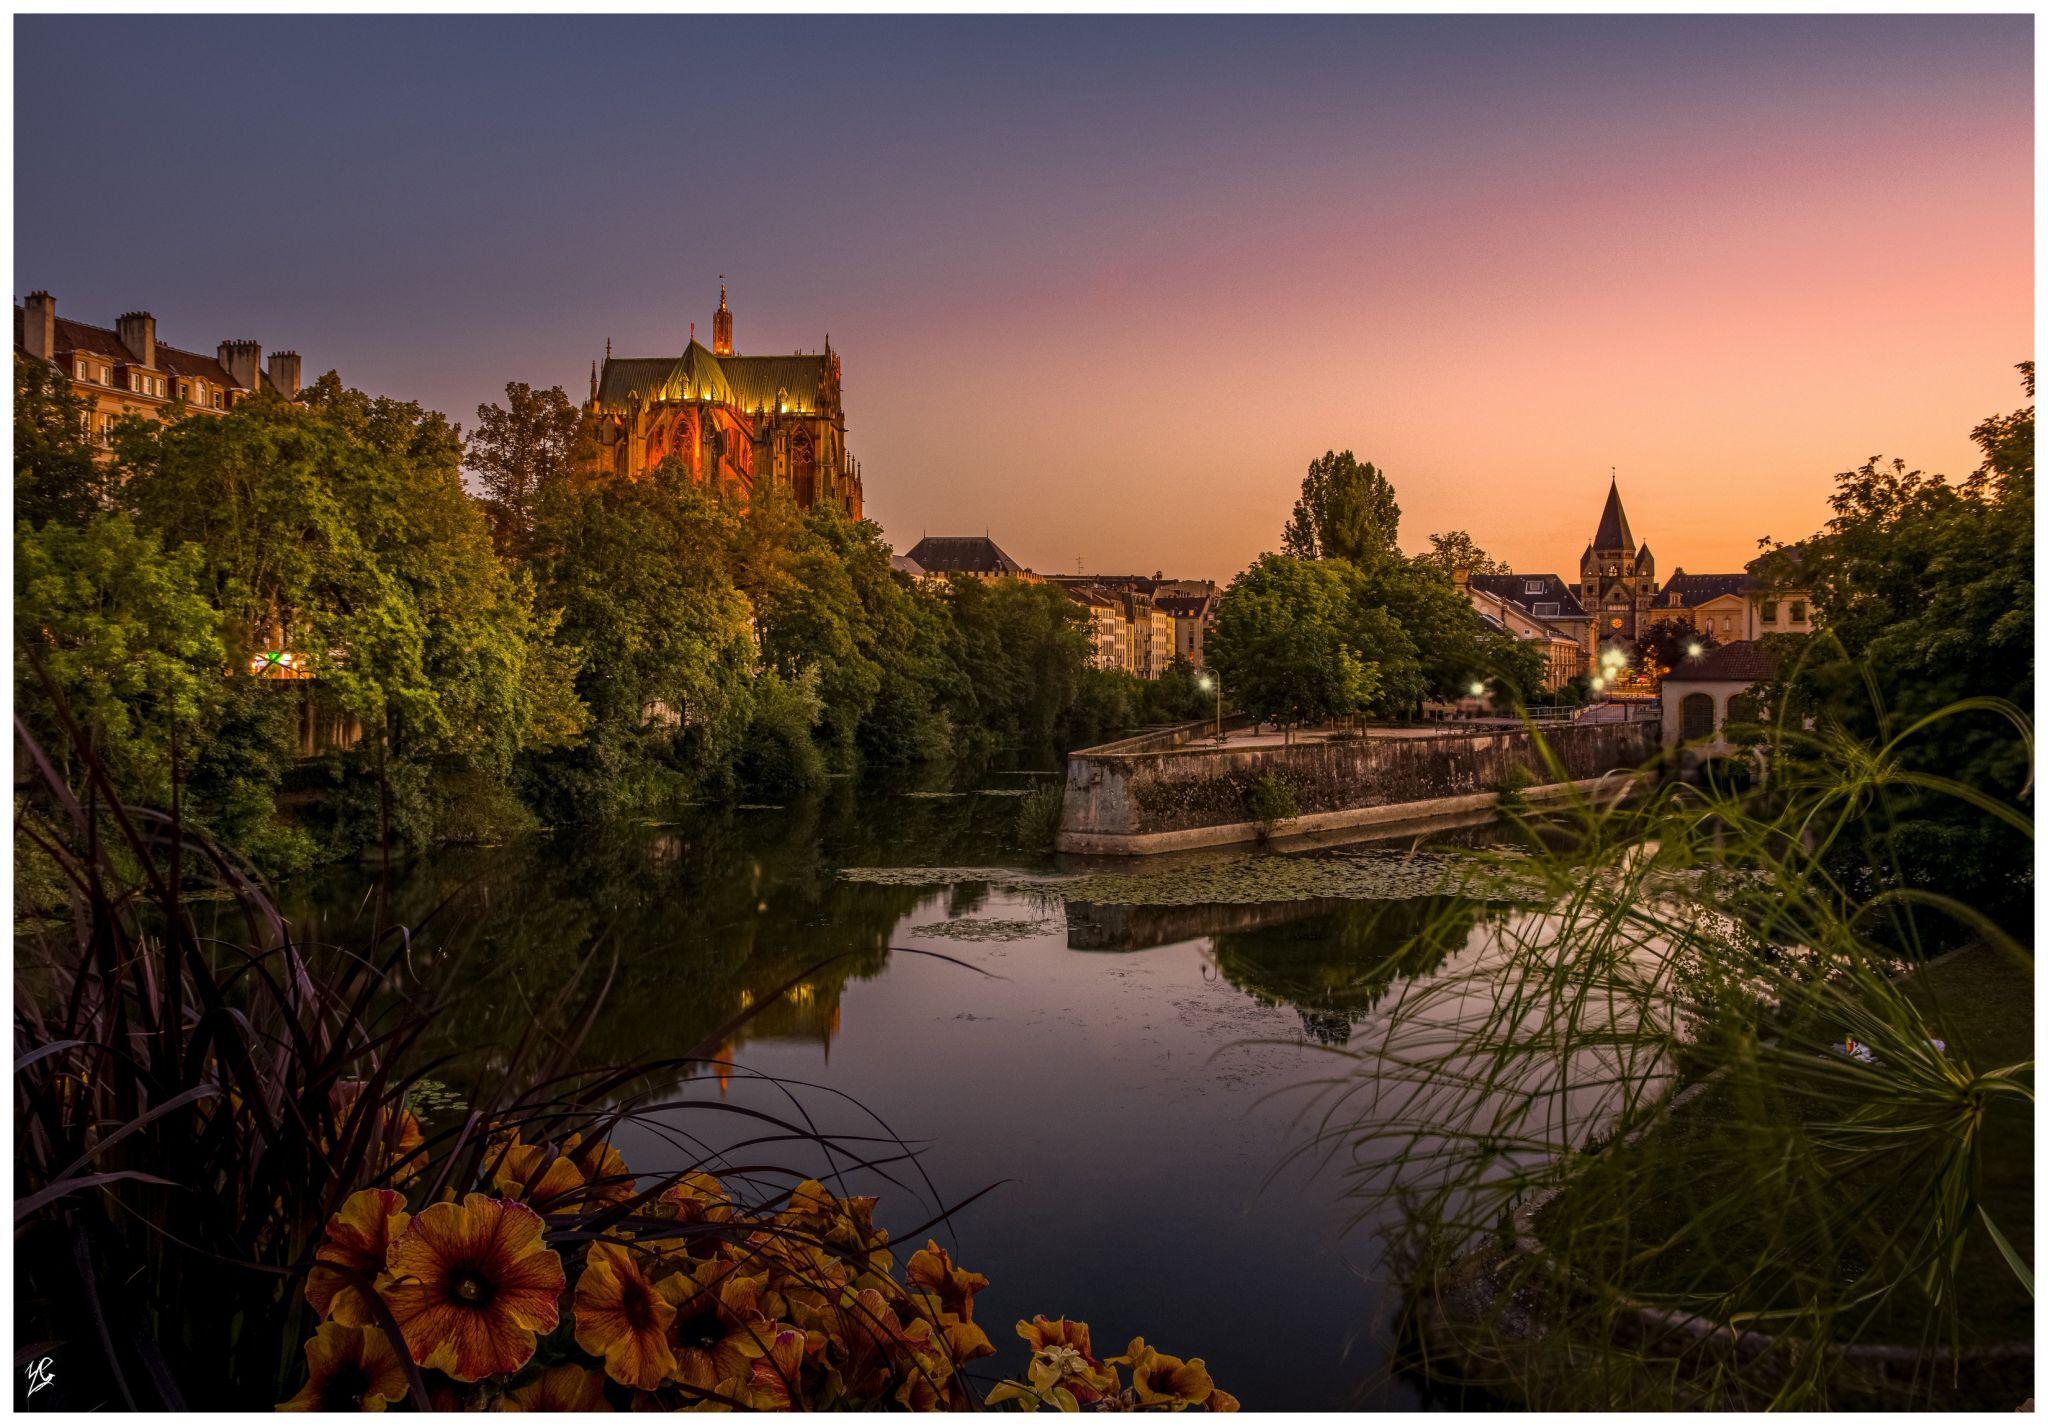 Cathédrale de Metz, France